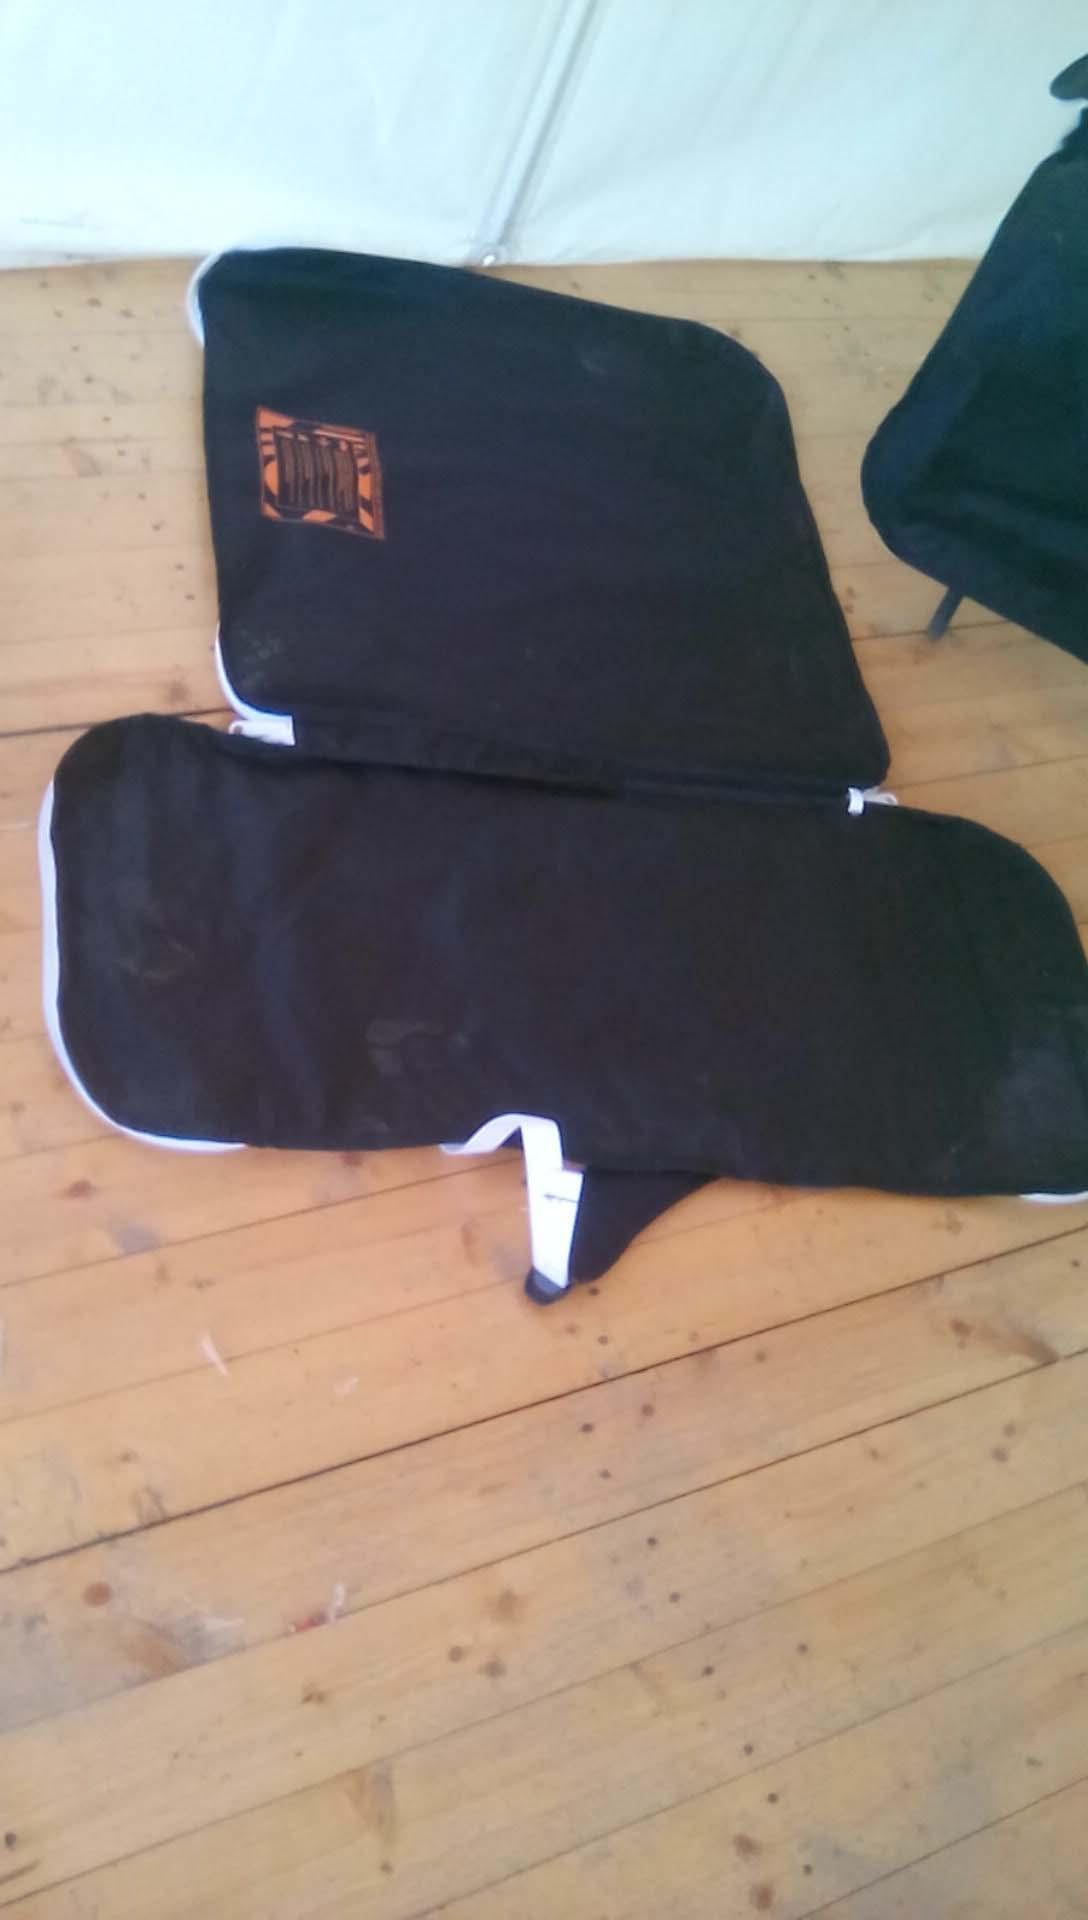 rrd-kite-2016-bag-ali-acquiloni-nuoviroberto-ricci-designs-offerta-bags-specials-offerts